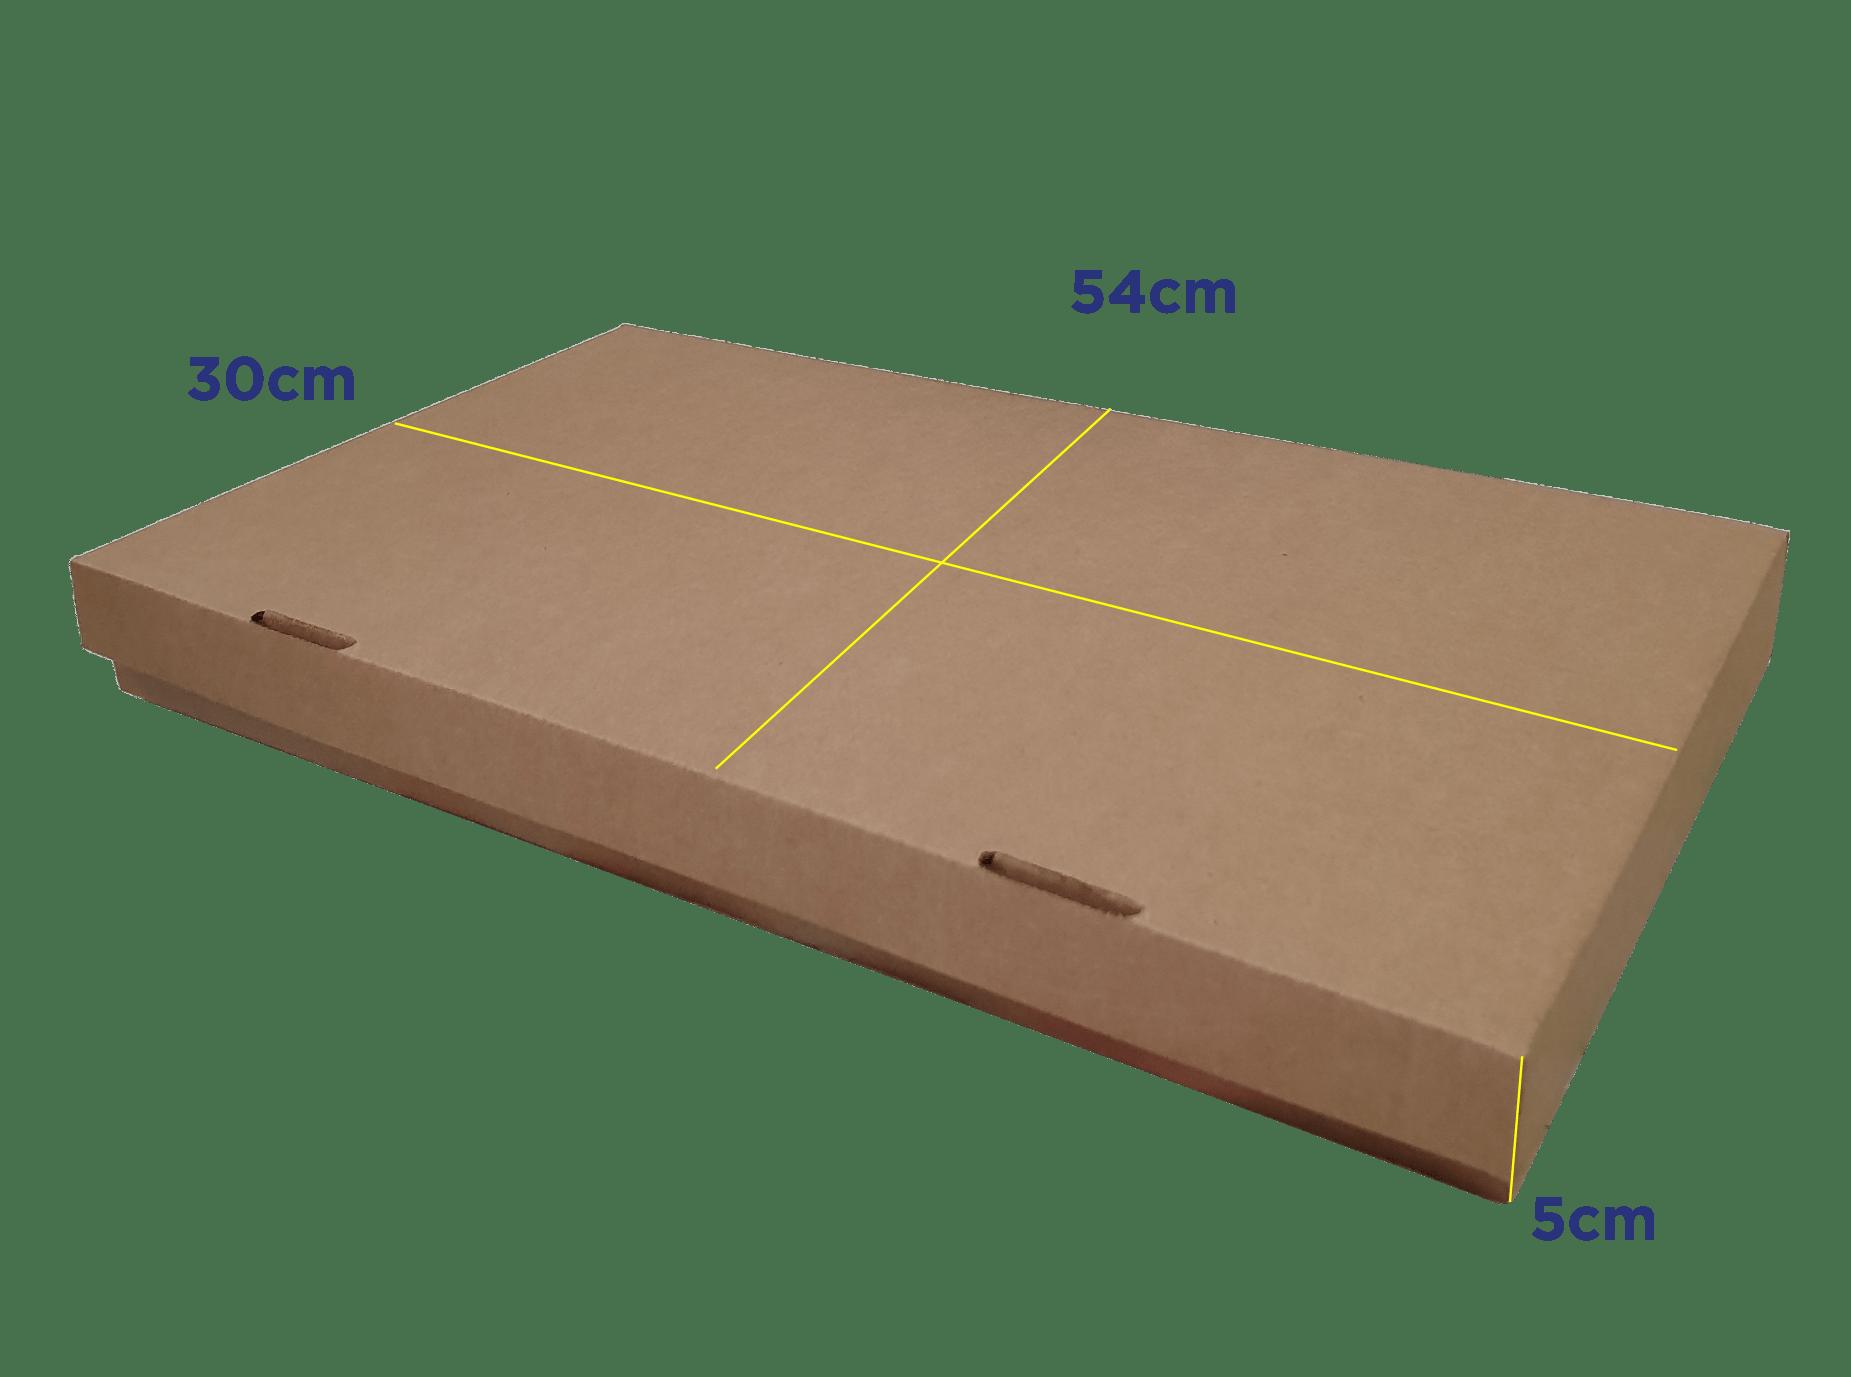 CAIXA RETANGULAR G - 54 x 30 x 5cm - PACK C/25 UND